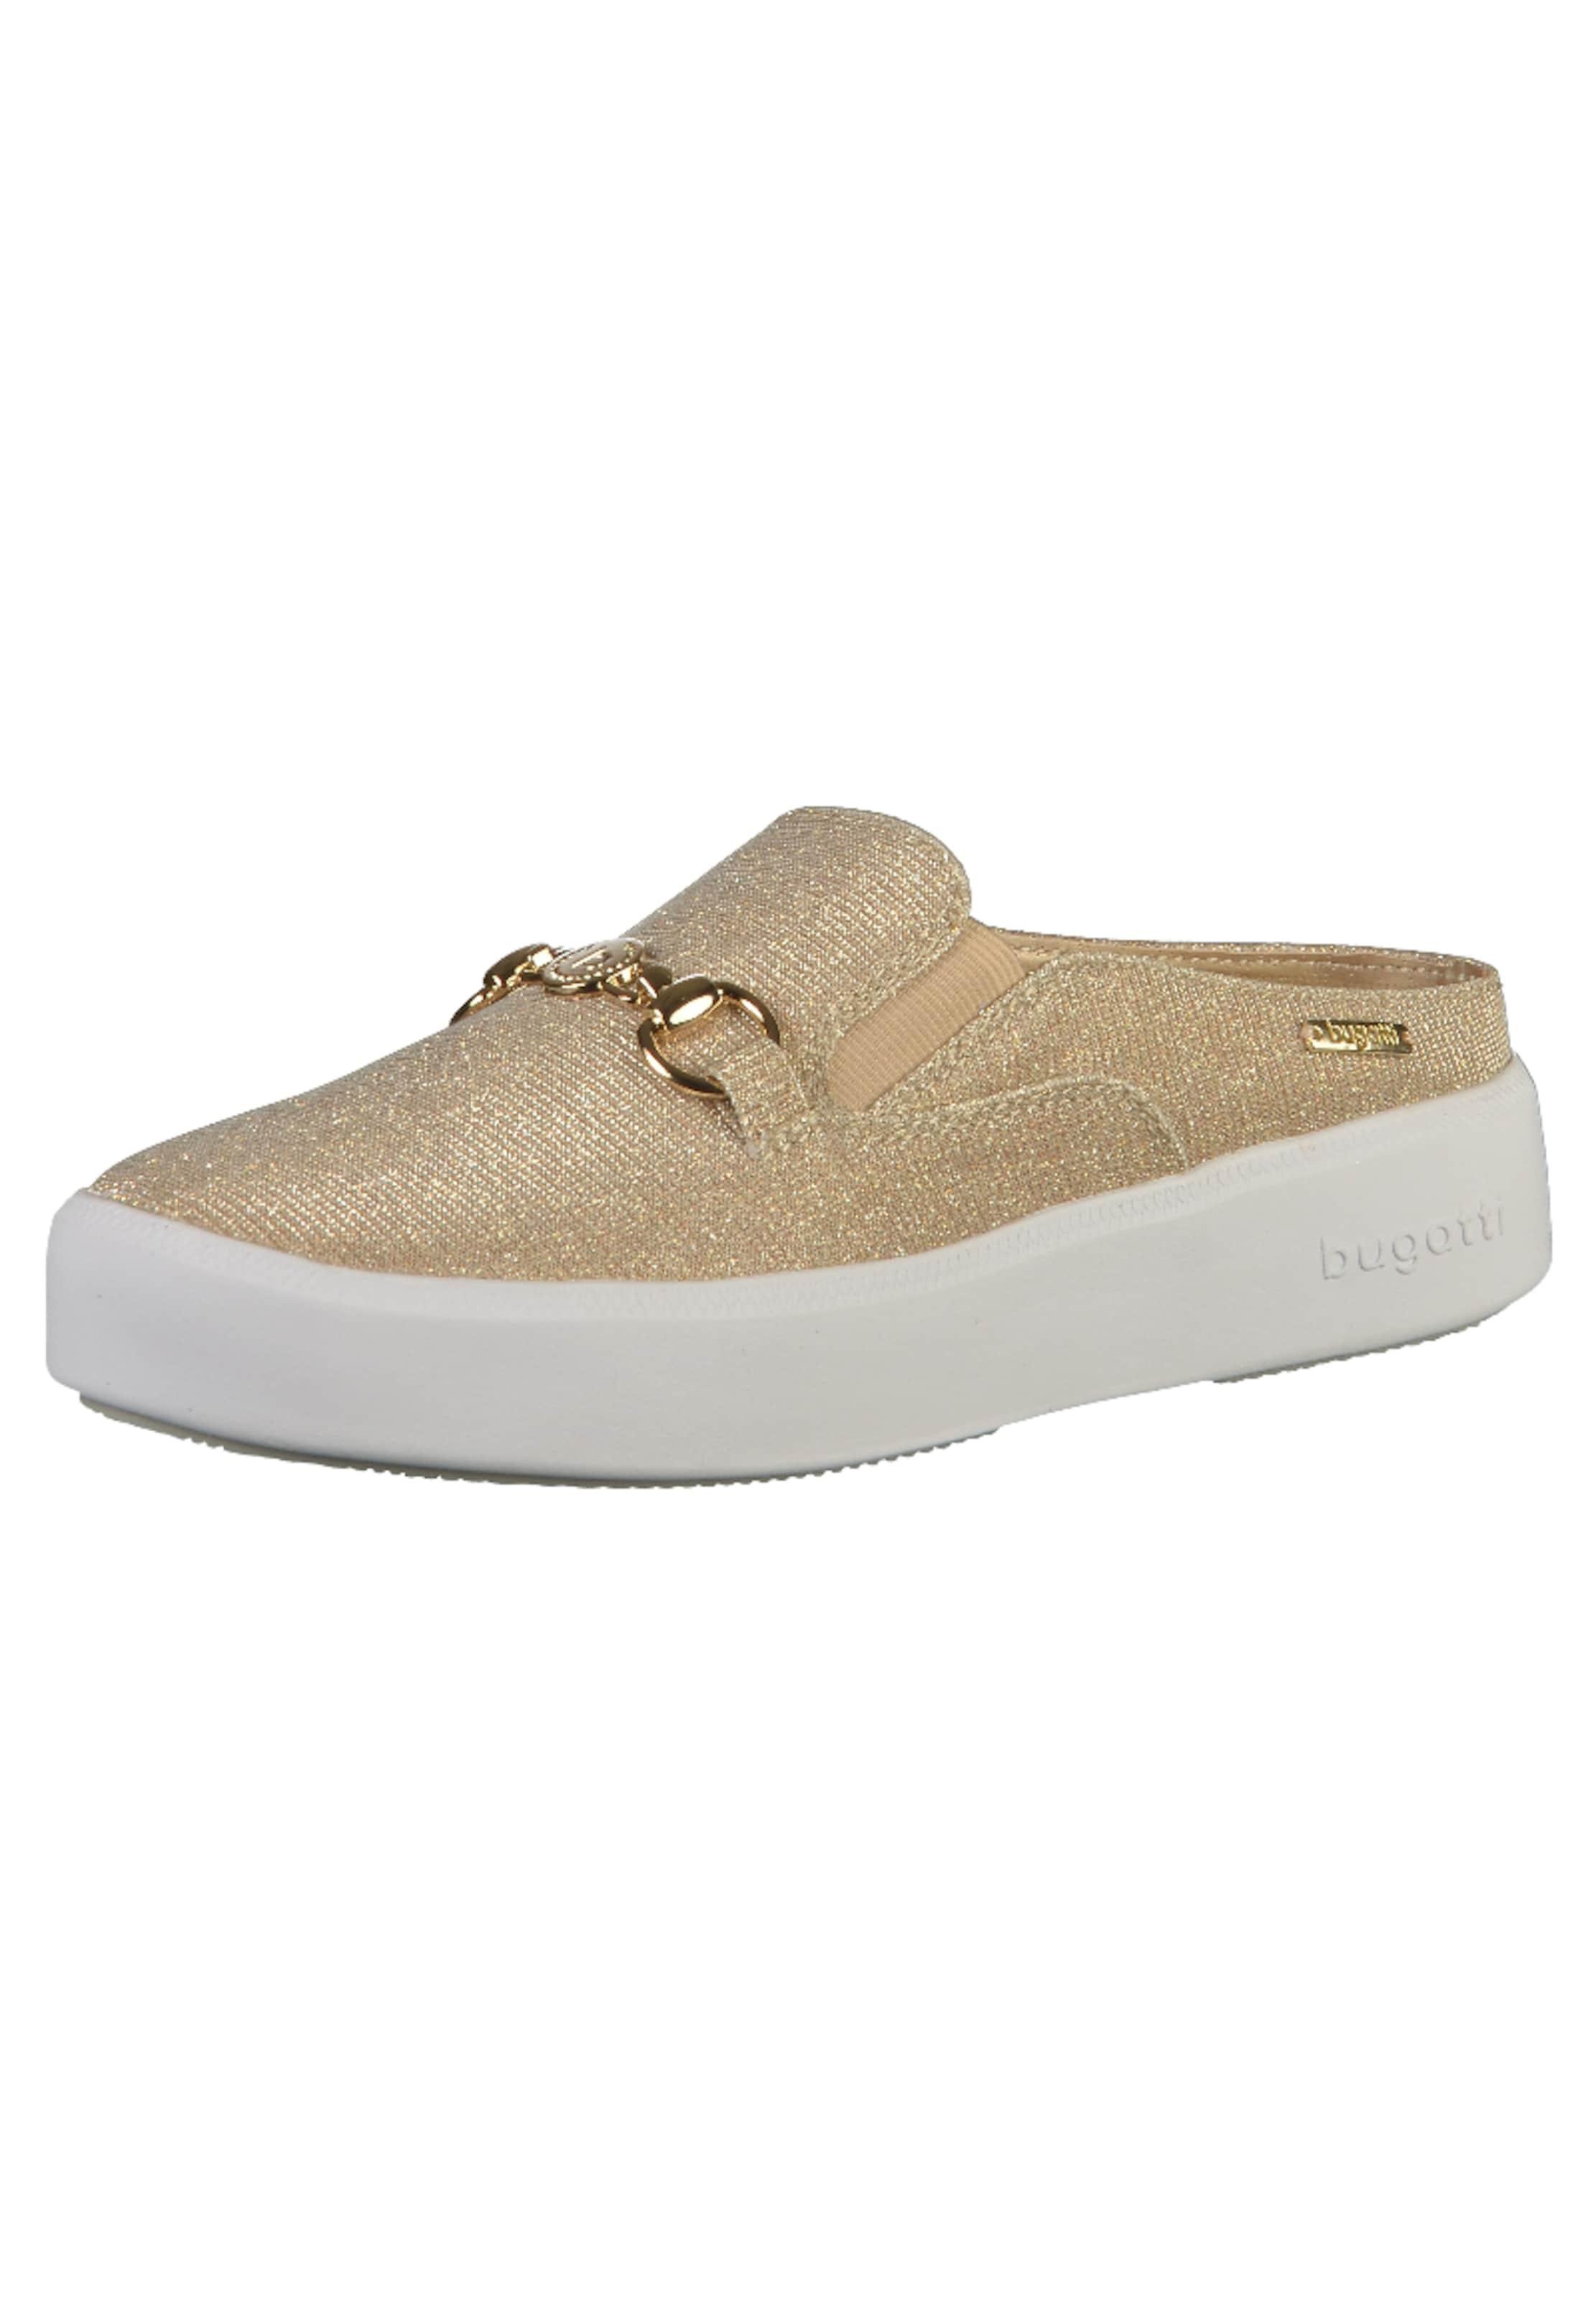 Haltbare Mode billige Schuhe bugatti   Slipper Schuhe Gut getragene Schuhe